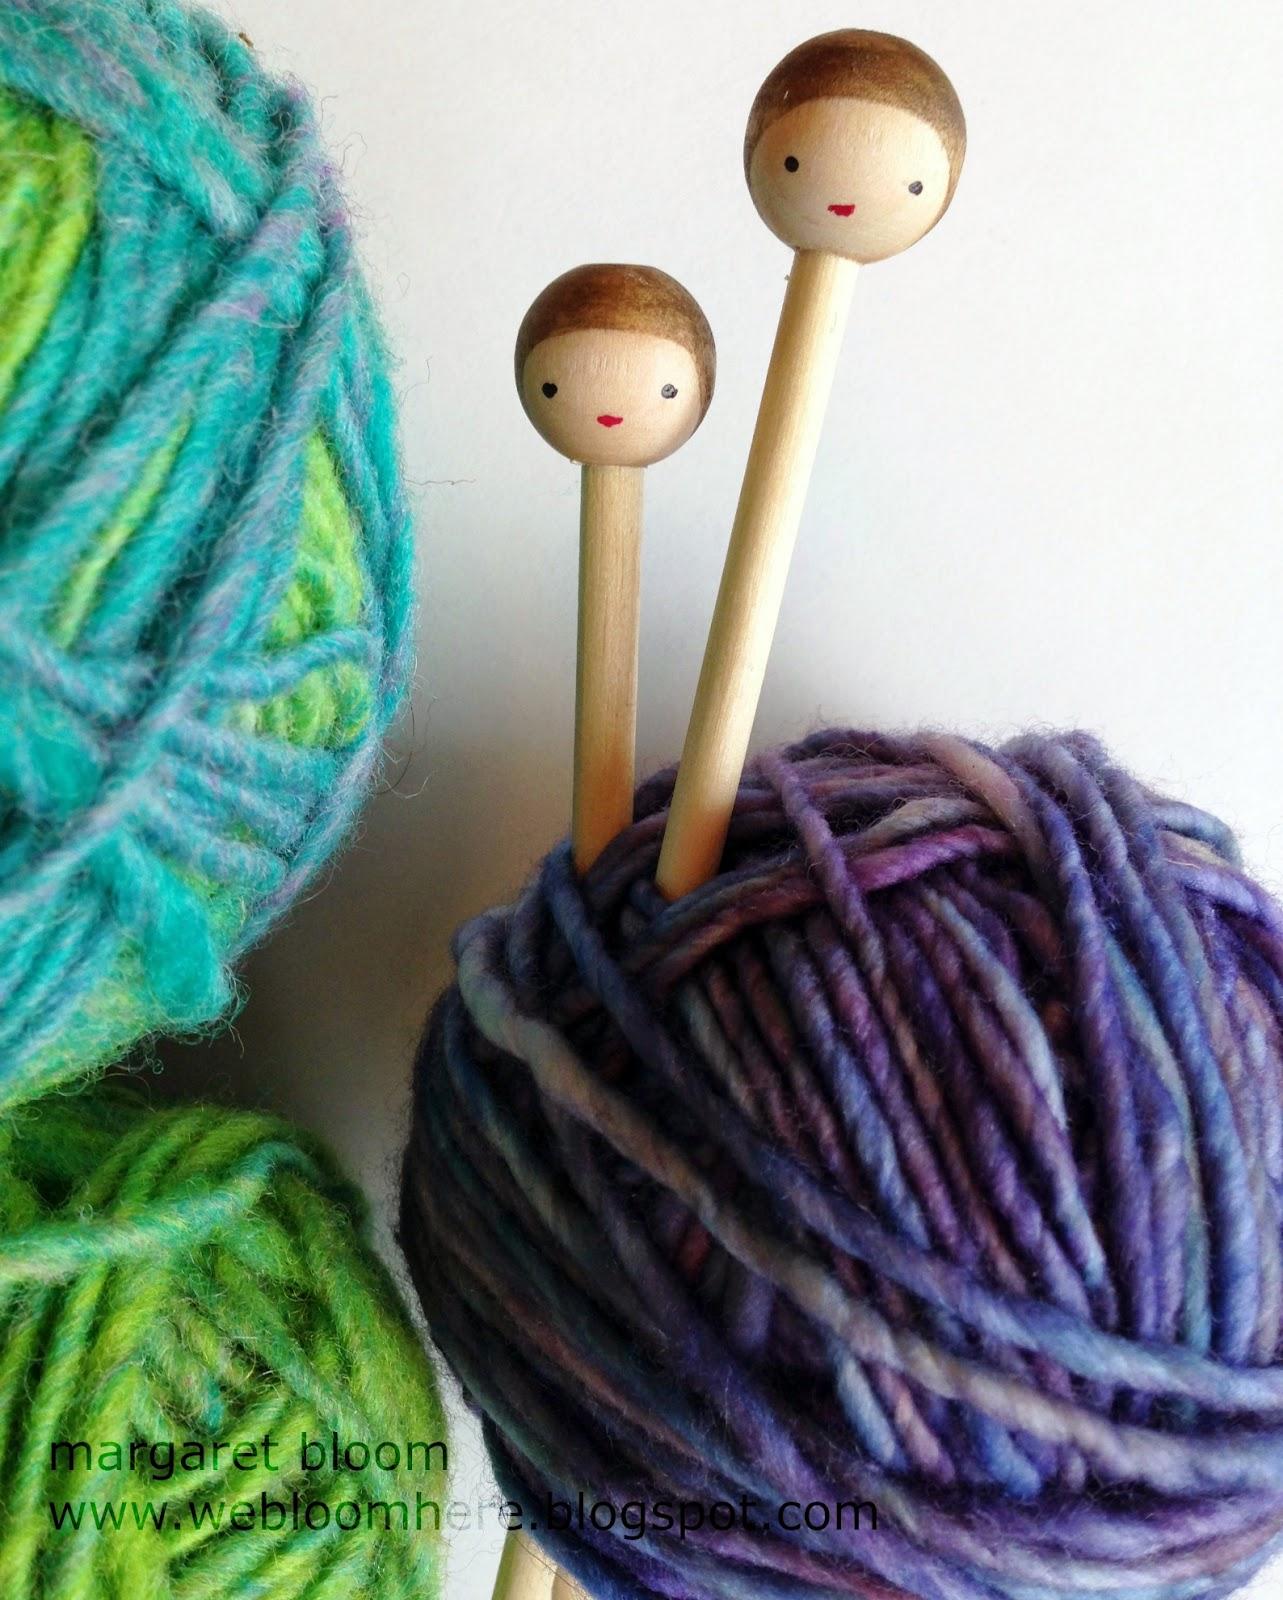 http://webloomhere.blogspot.com/2014/11/hair-sticks-knitting-needles-tutorial.html